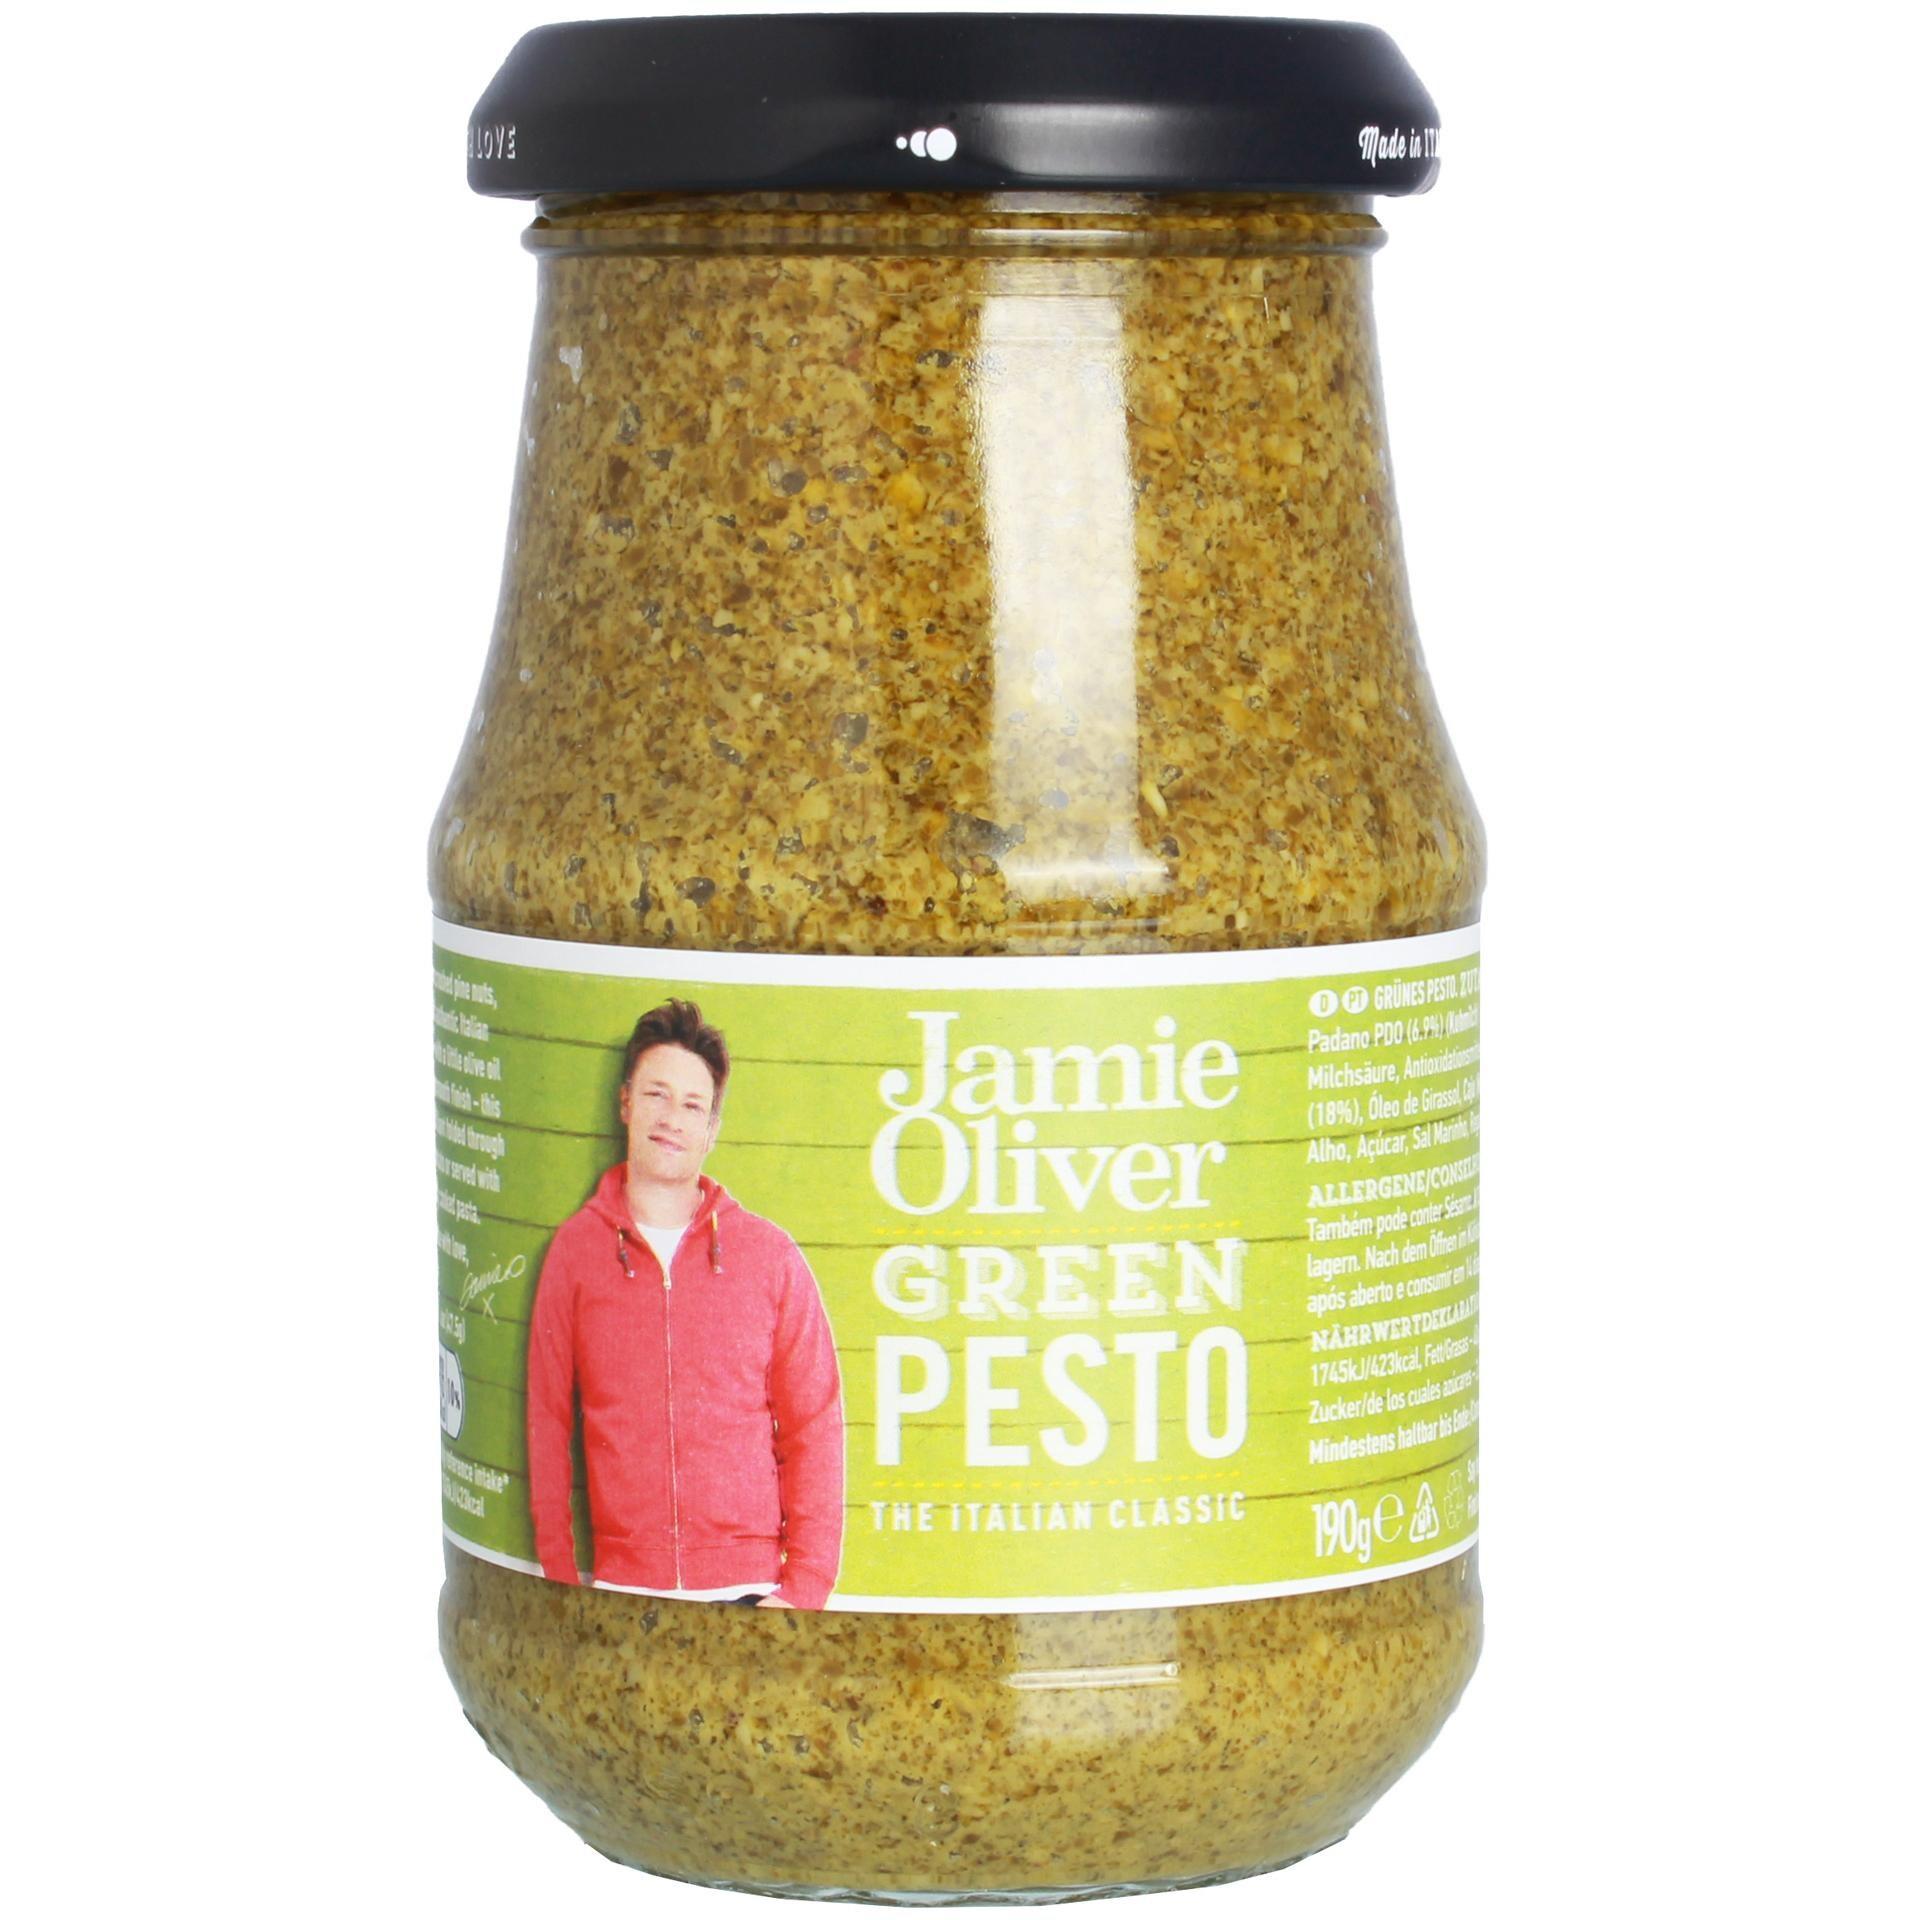 Jamie Oliver - Green Pesto Sauce - 190g